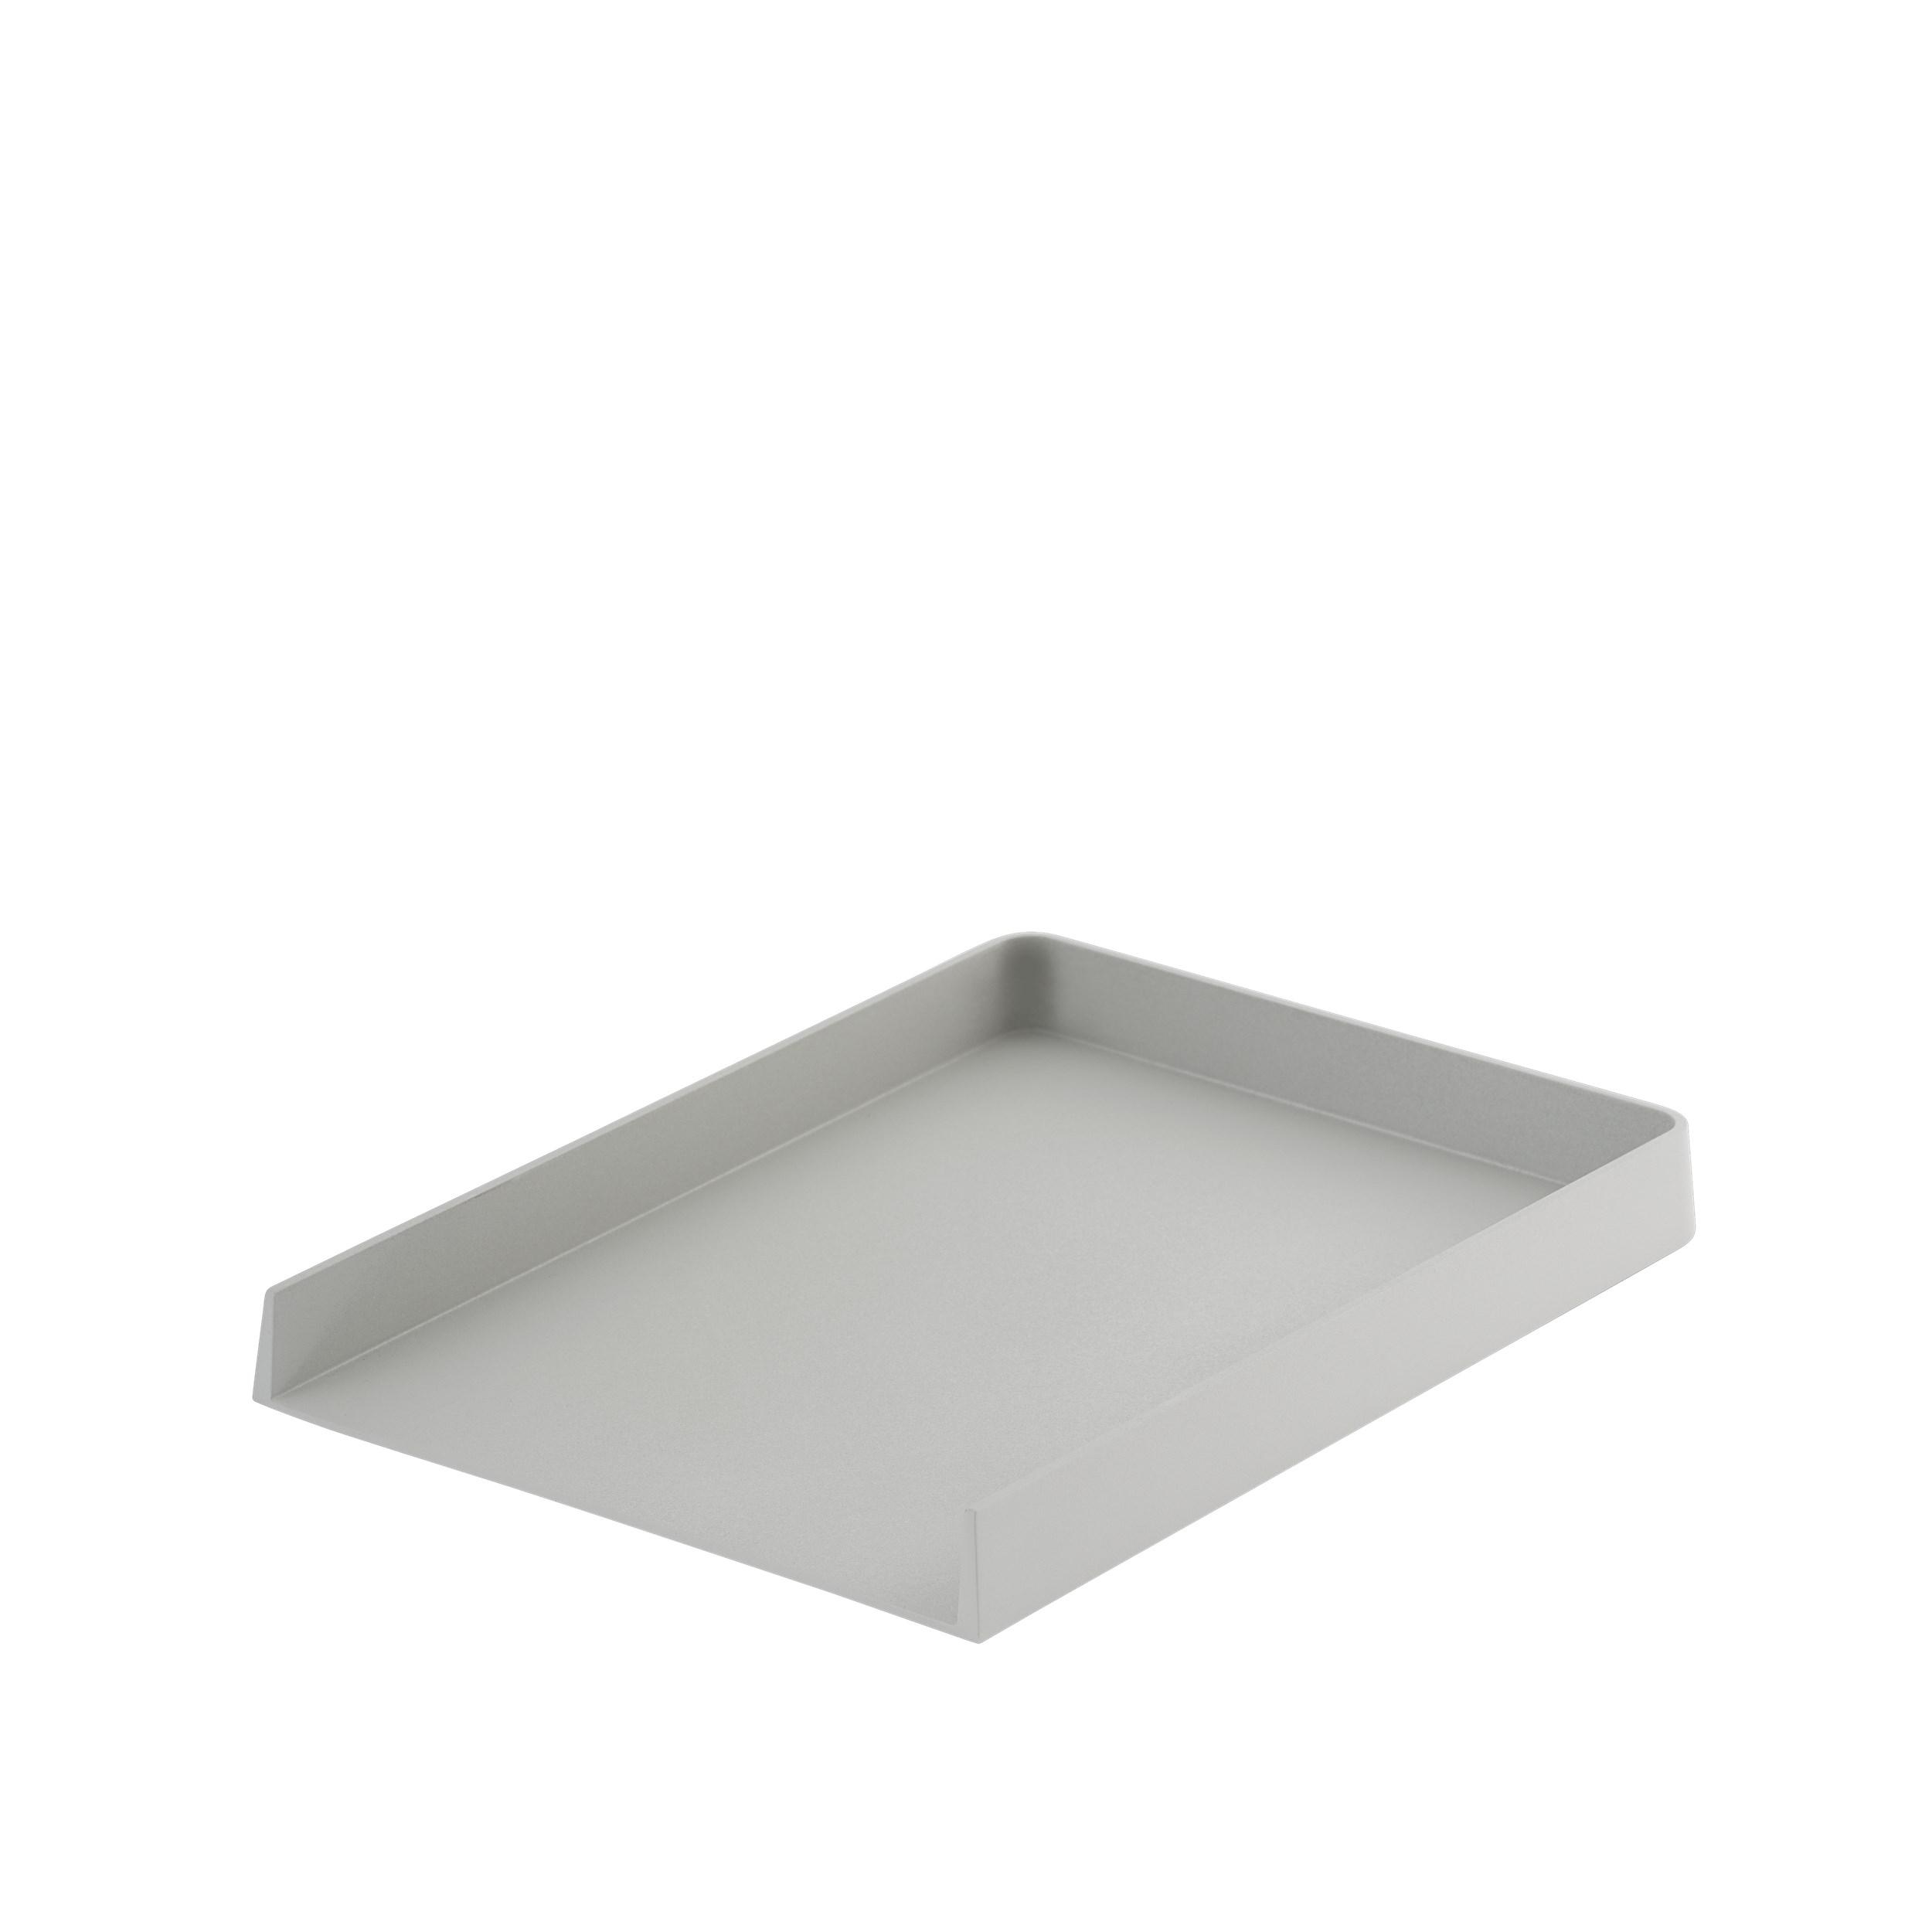 Muuto Arrange Tray 32x25 Grey